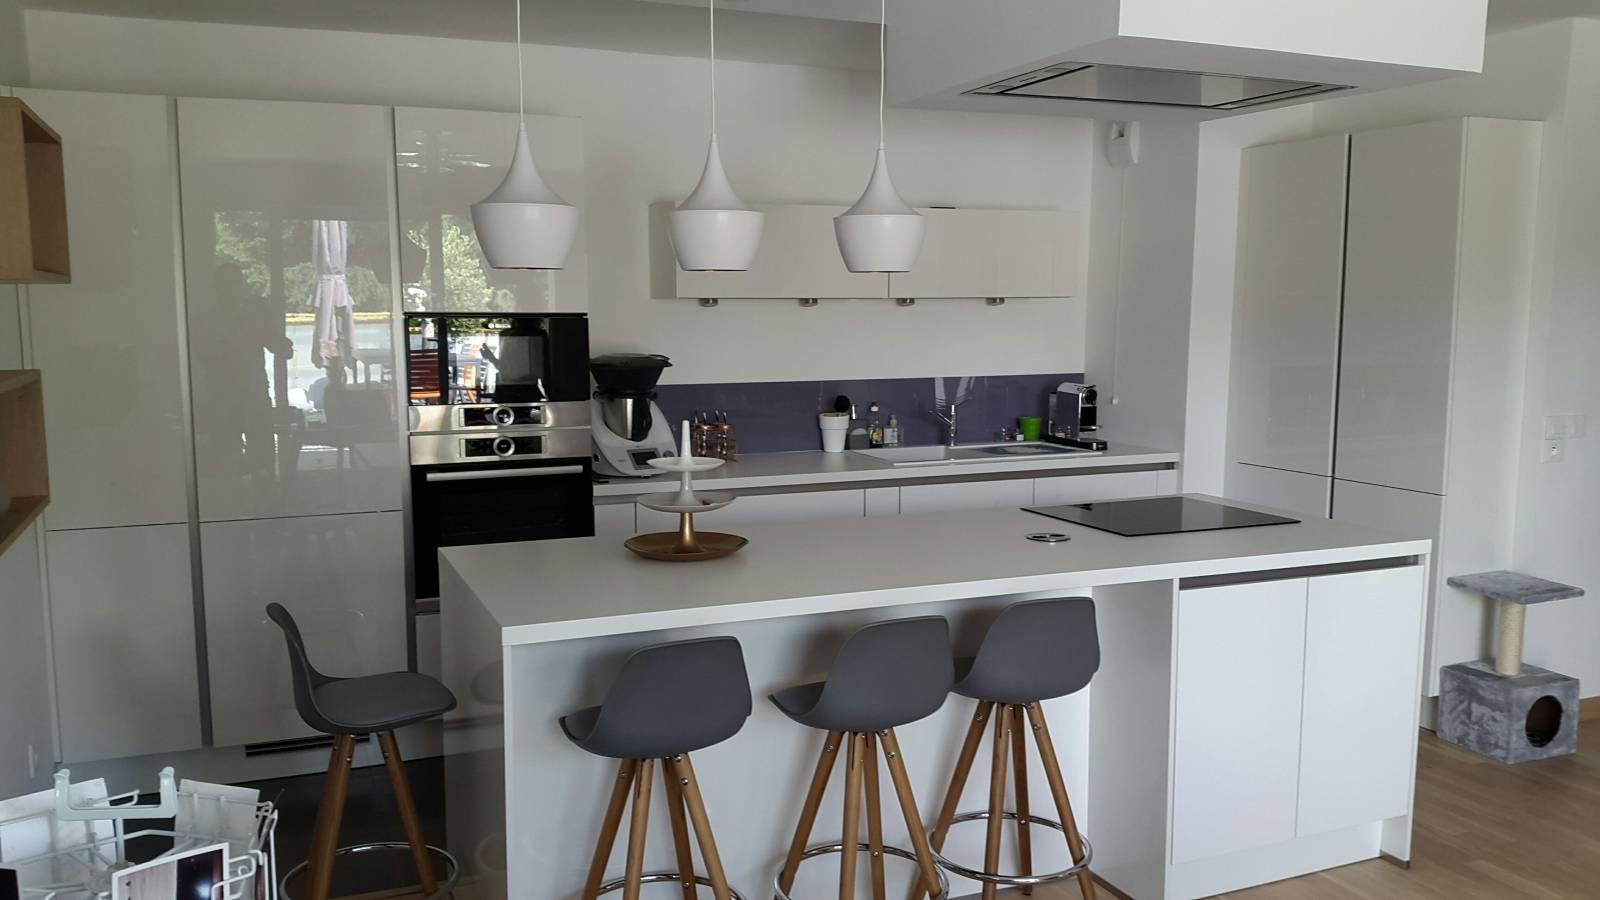 cuisine ilot central blanche lentilly 69210 lyon adc cuisine. Black Bedroom Furniture Sets. Home Design Ideas